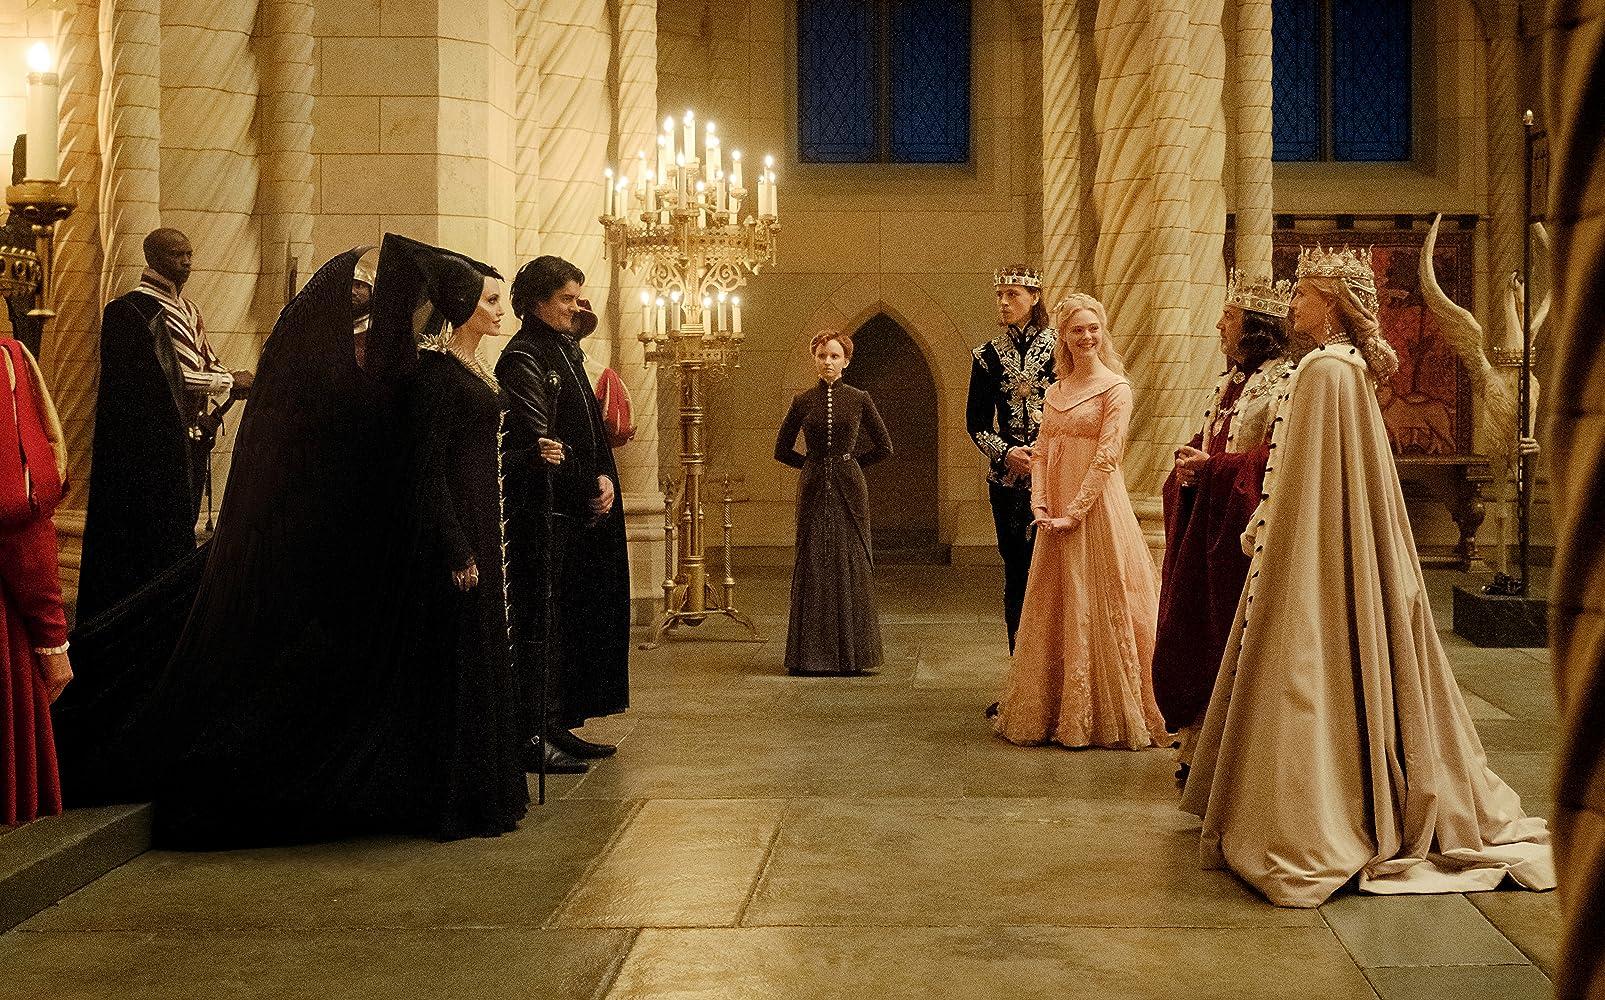 Michelle Pfeiffer, Angelina Jolie, Robert Lindsay, Sam Riley, Elle Fanning, David Gyasi, Jenn Murray, and Harris Dickinson in Maleficent: Mistress of Evil (2019)